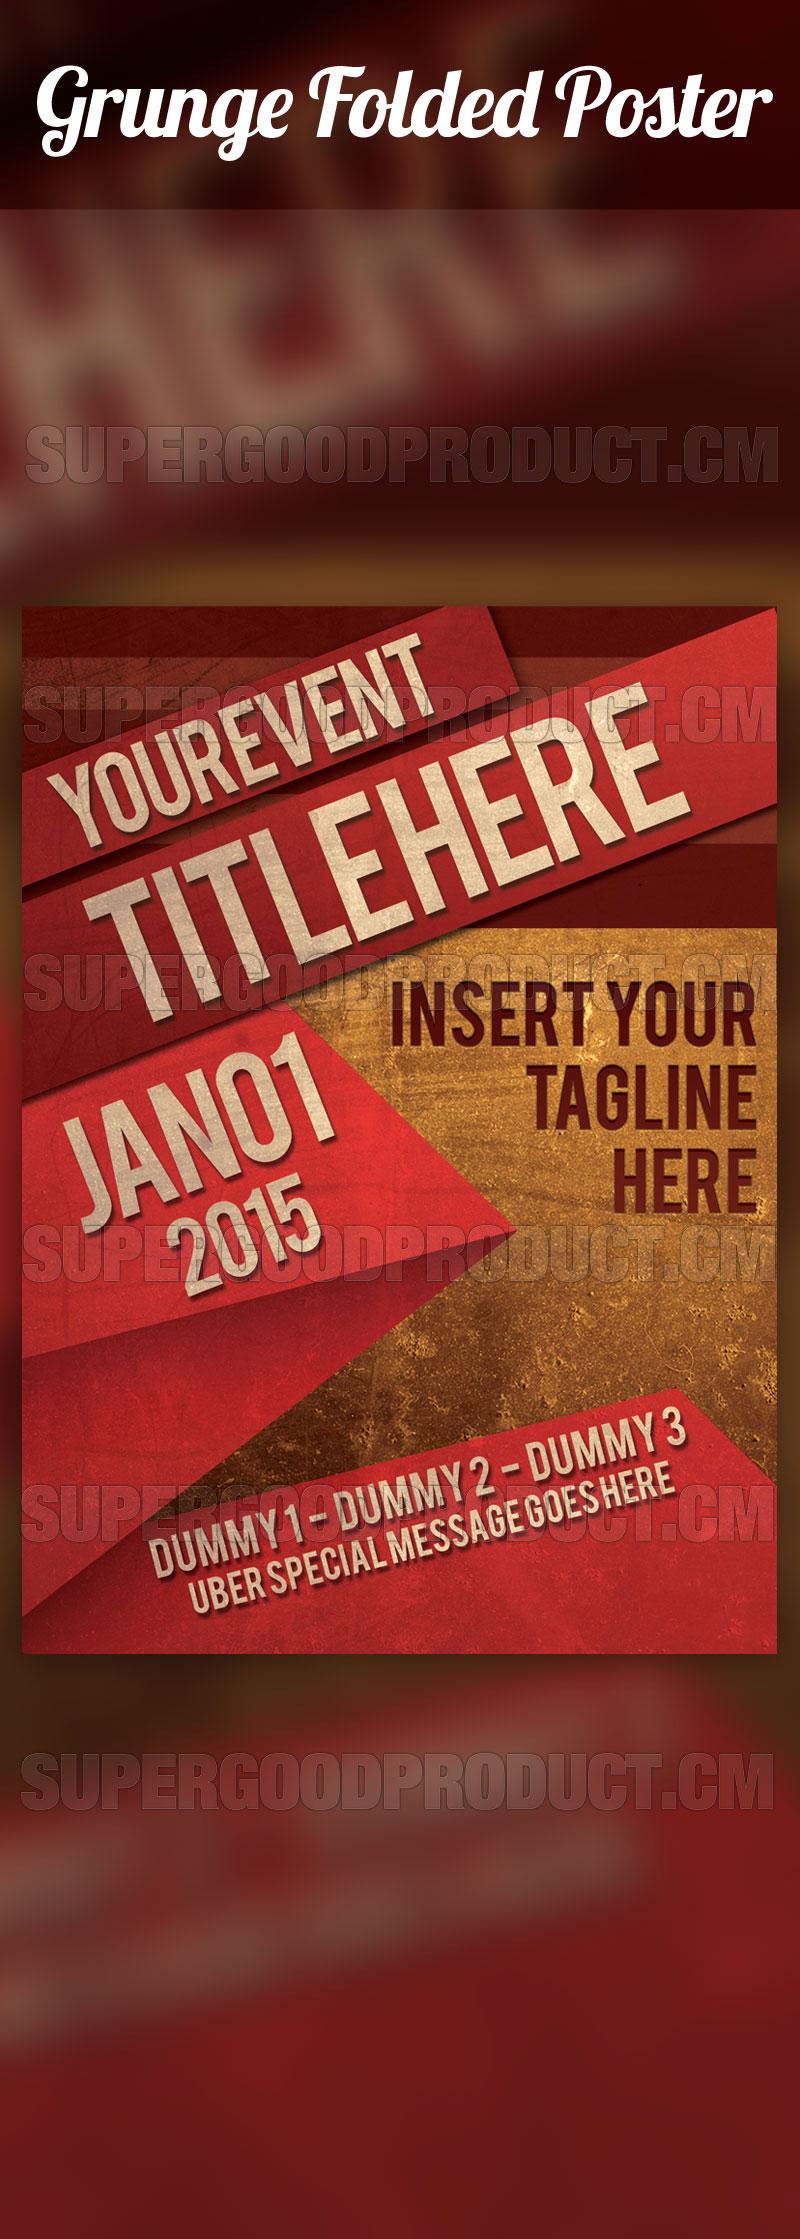 Grunge-Folded-Poster